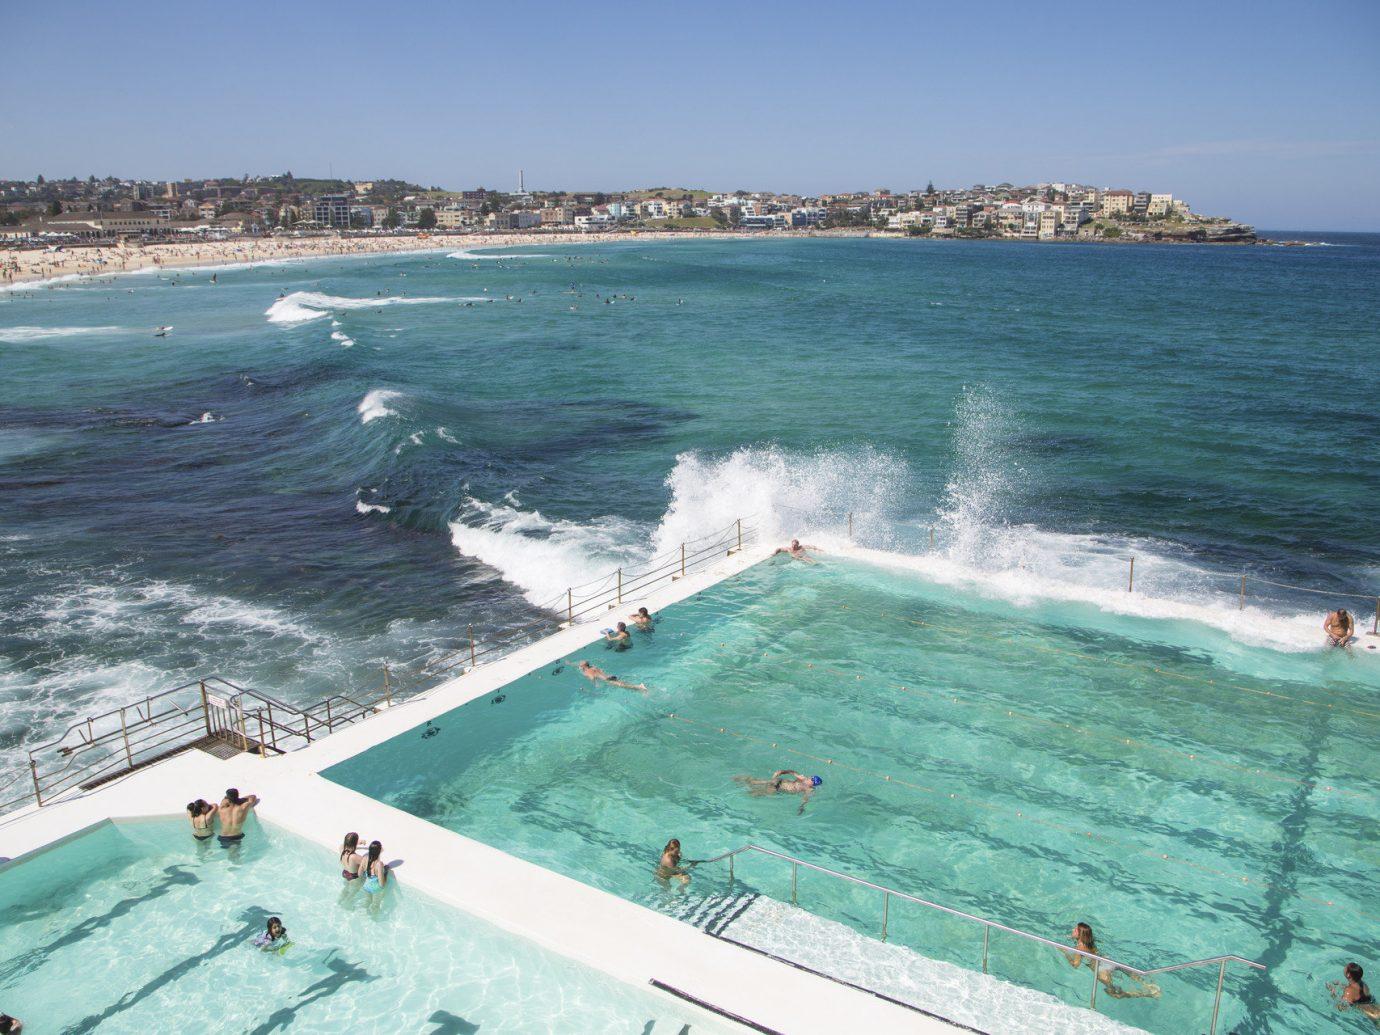 Bondi Icebergs Club, Bondi, Greater Sydney, New South Wales